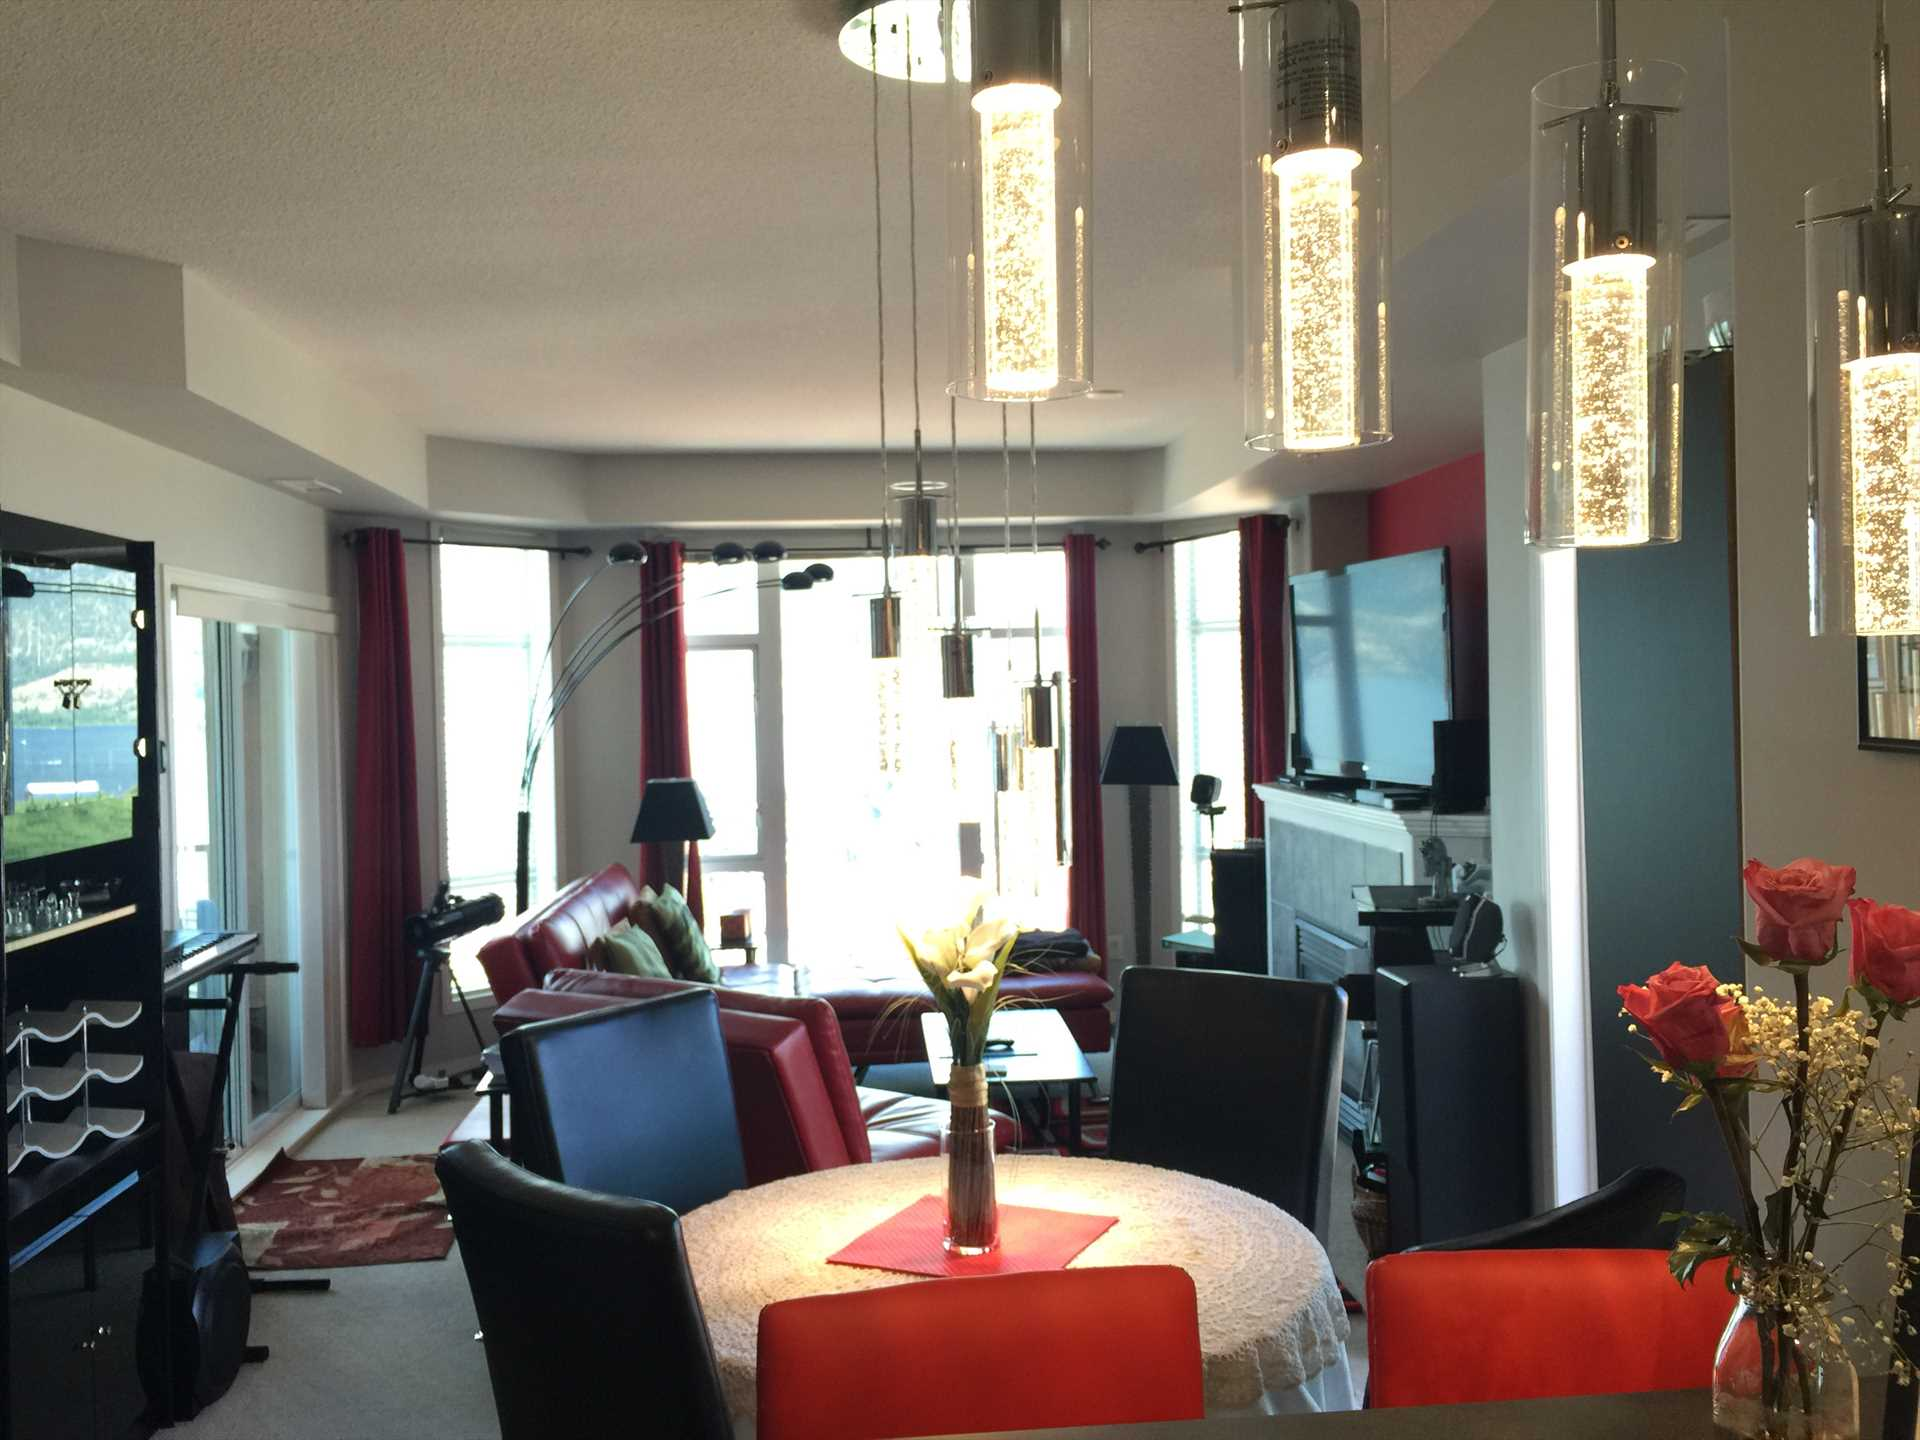 Dining Room showing Living Room and Lake Okanagan